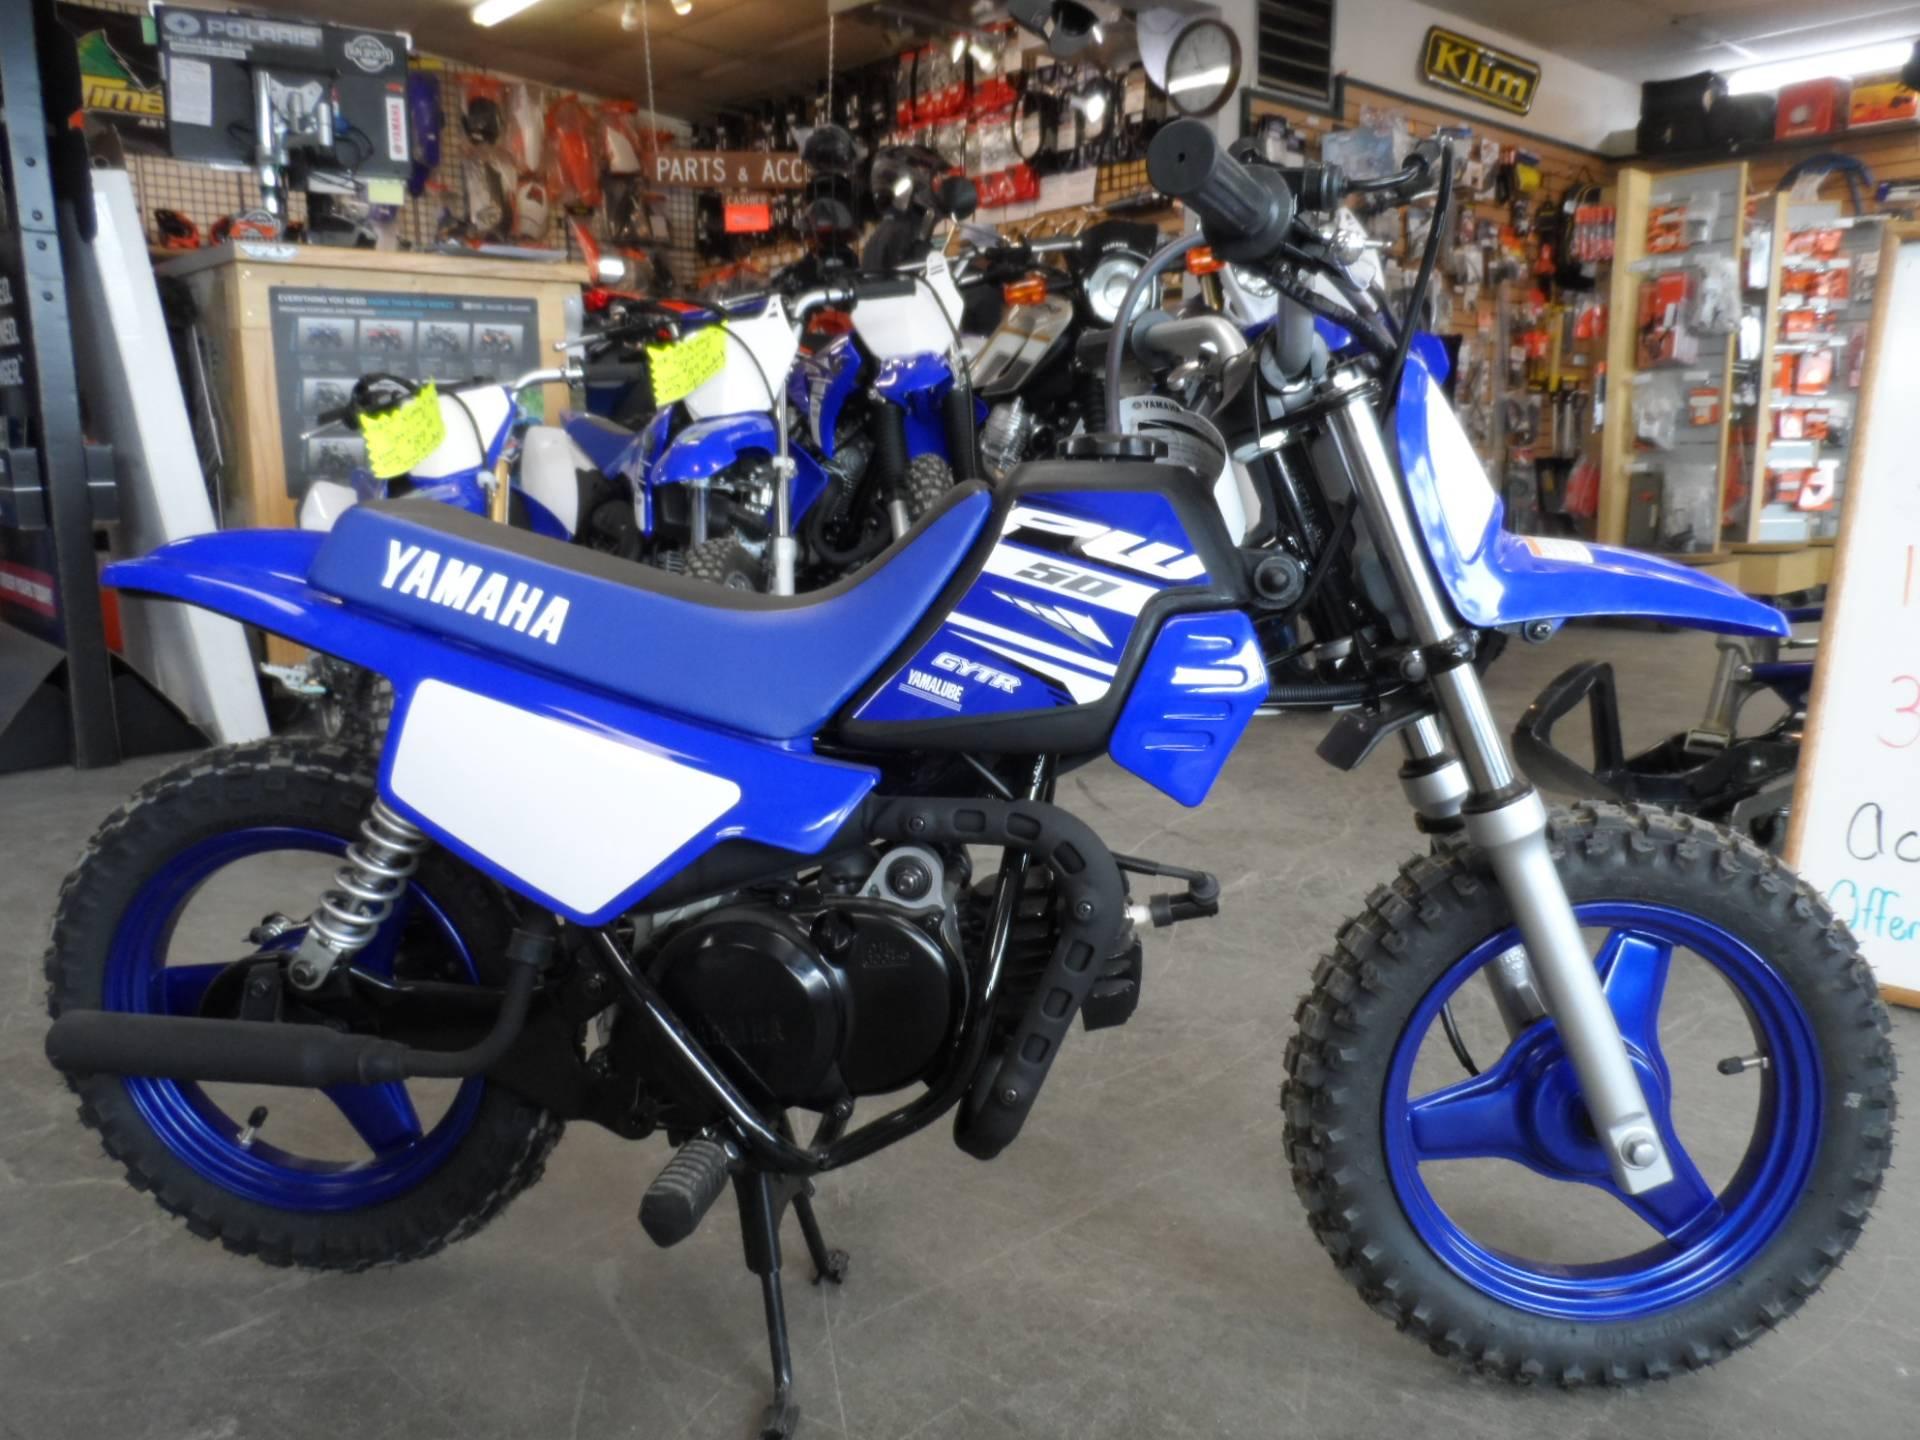 2018 Yamaha PW50 for sale 85904